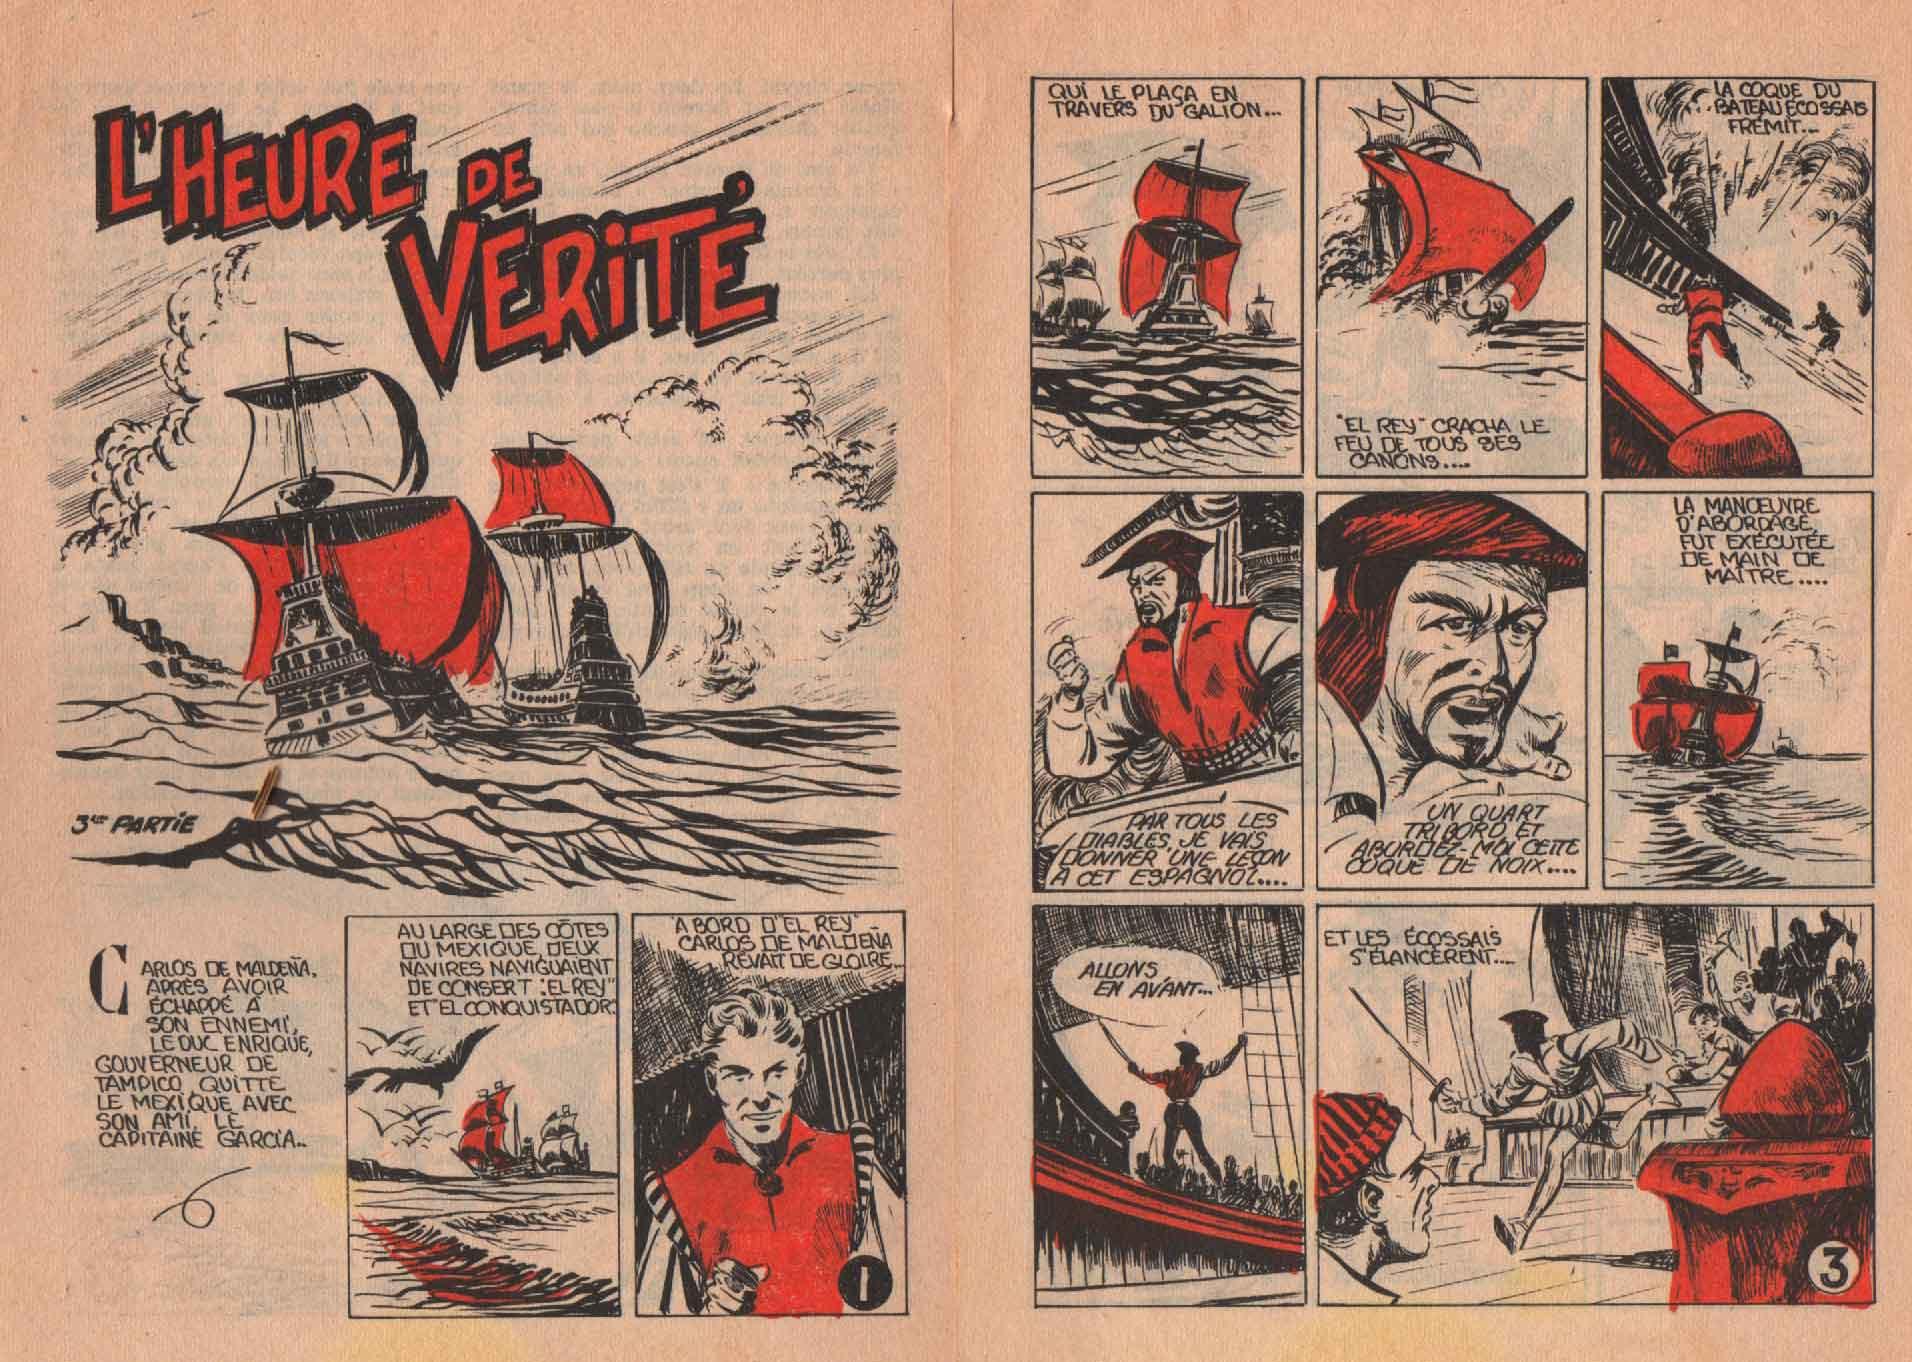 « L'Heure de vérité » Caramba n° 3 (08/1955).